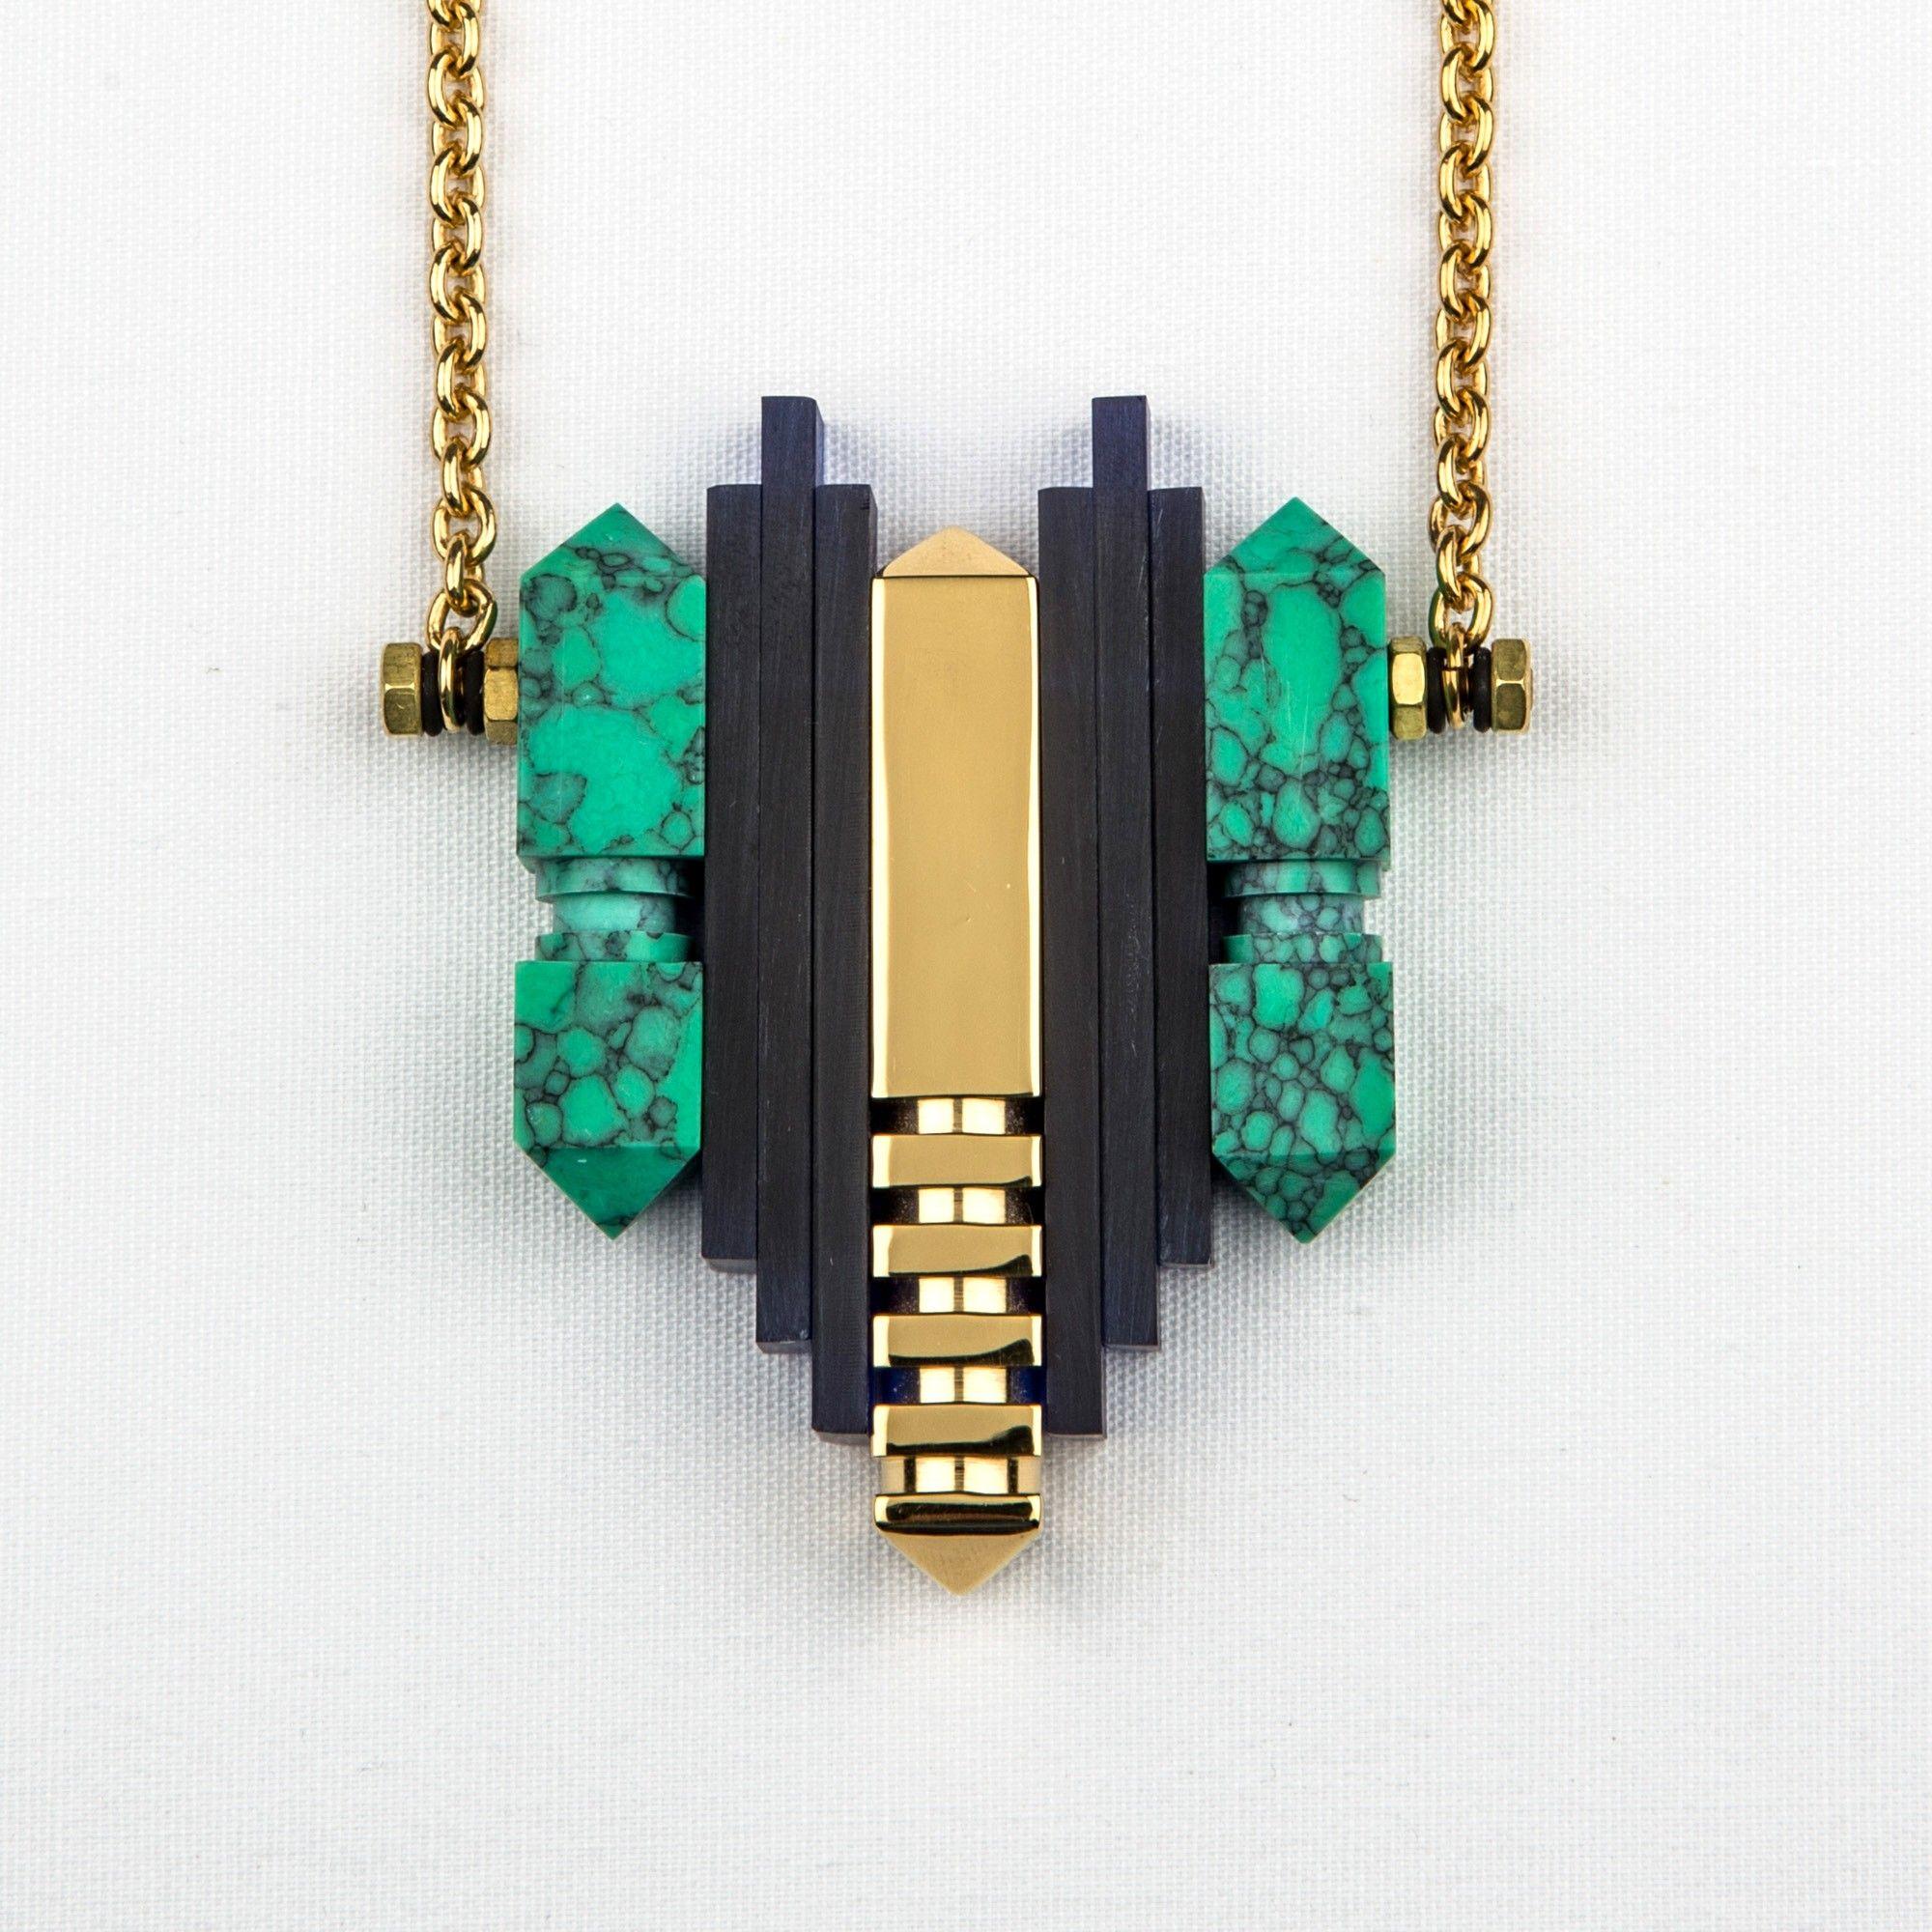 JEWELLERY - Necklaces Lily Kamper OJOOluzxM